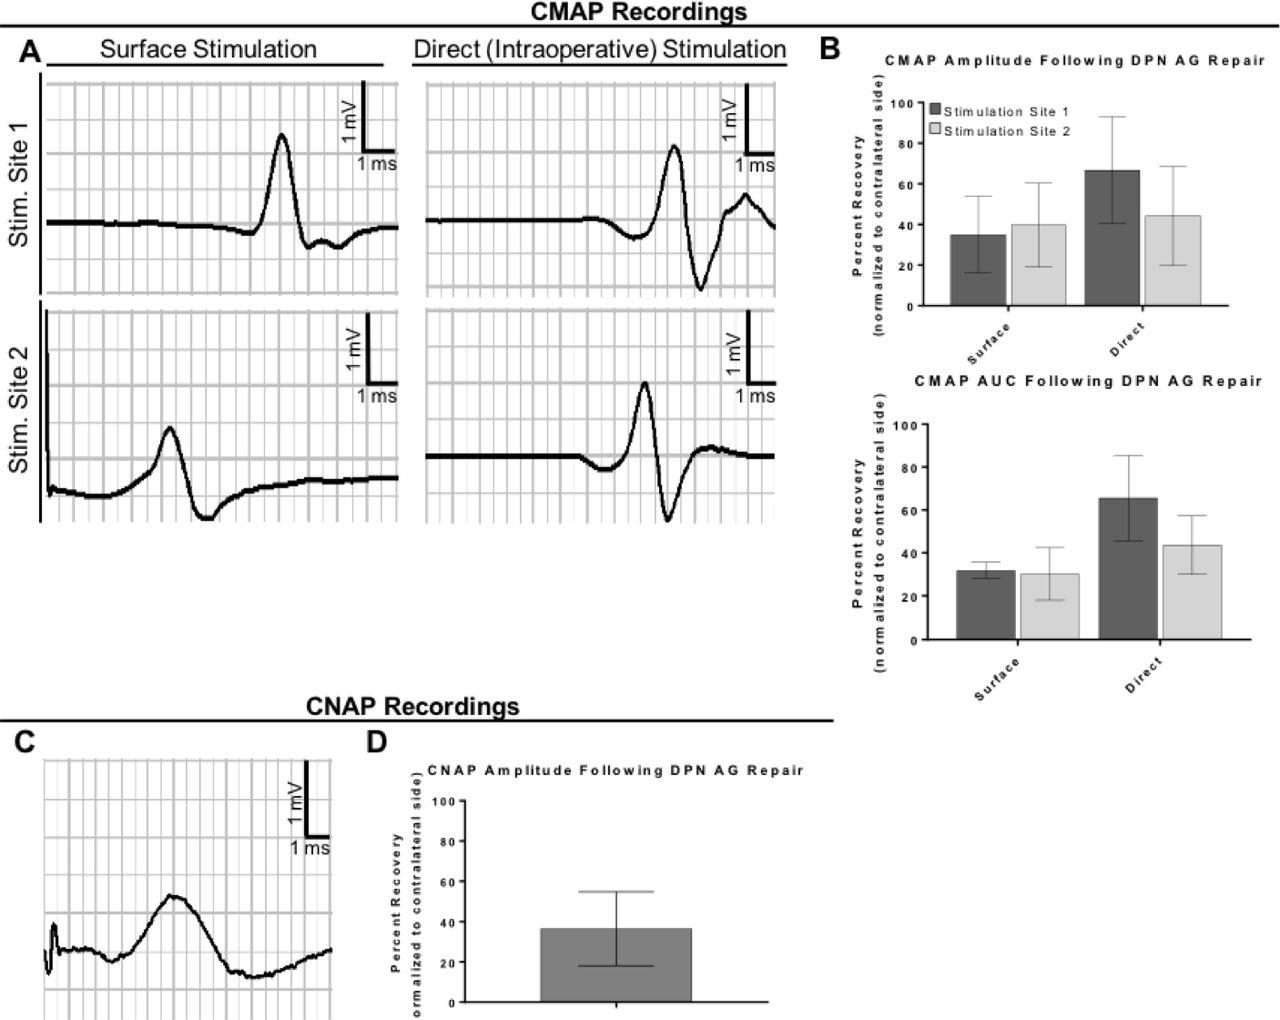 A Porcine Model of Peripheral Nerve Injury Enabling Ultra